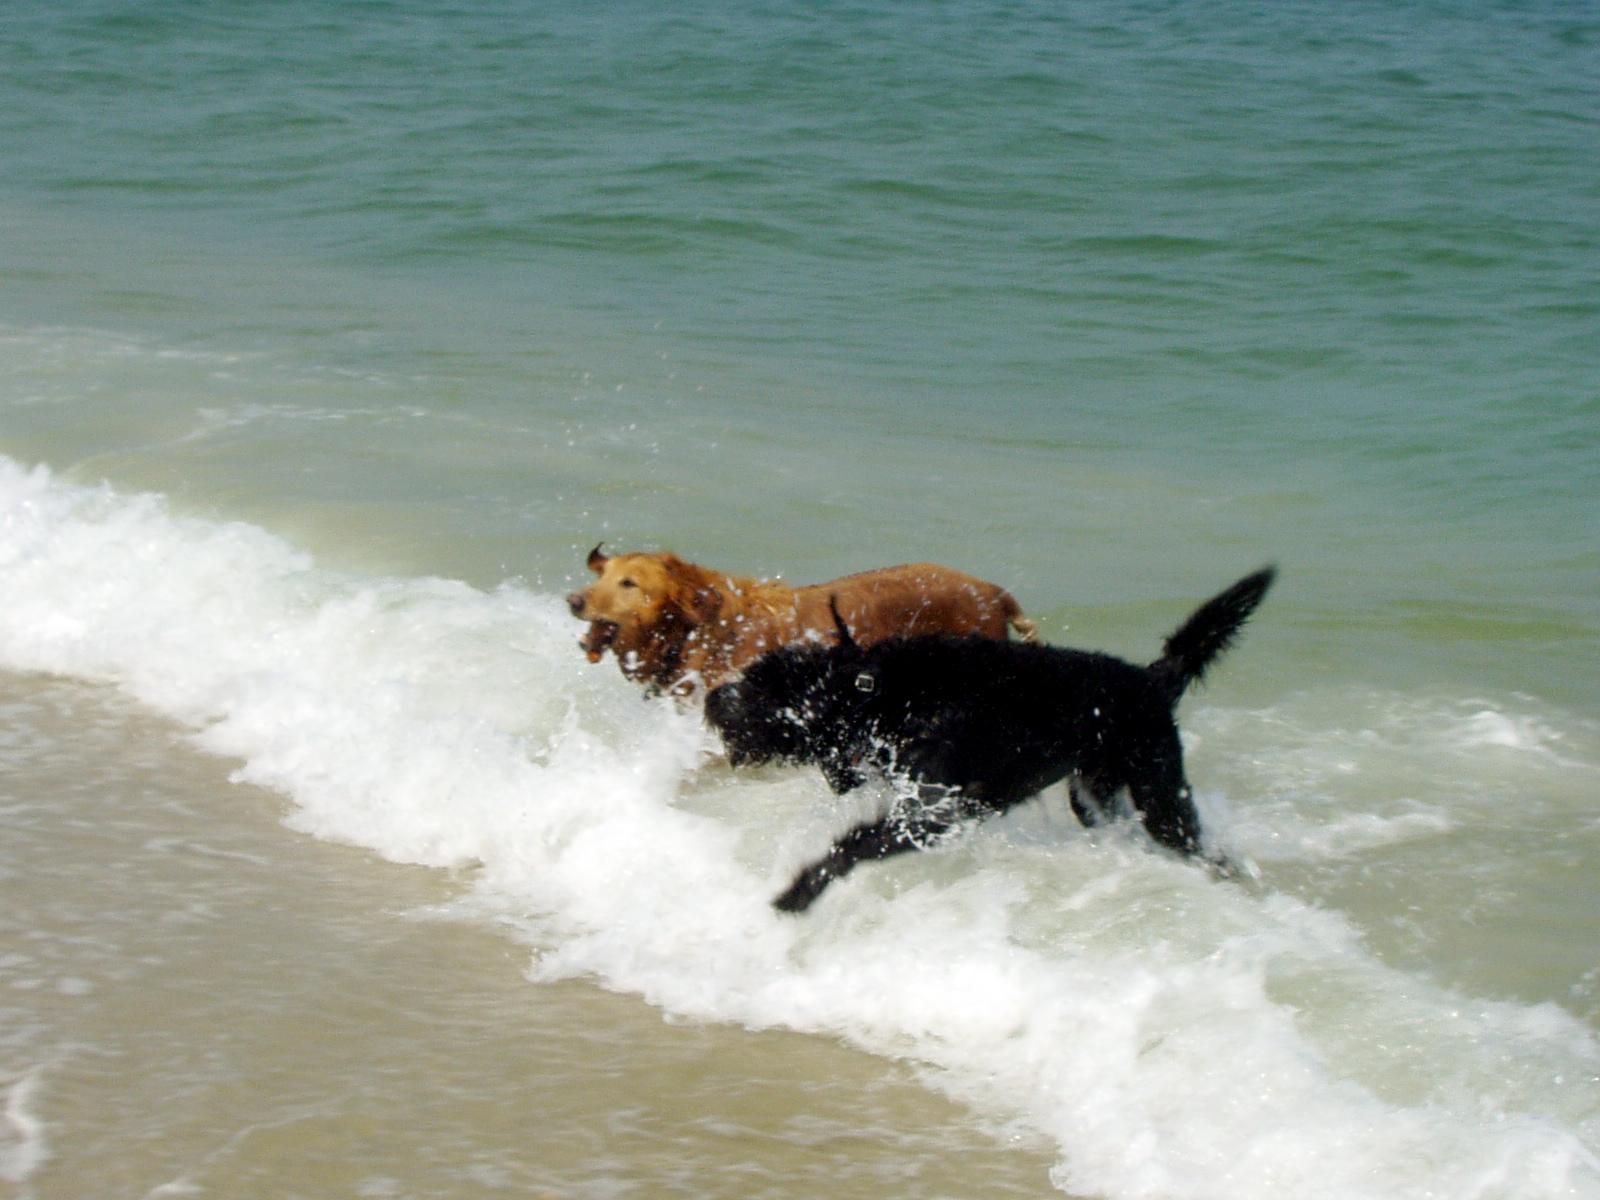 hikewithyourdog: Island Beach State Park